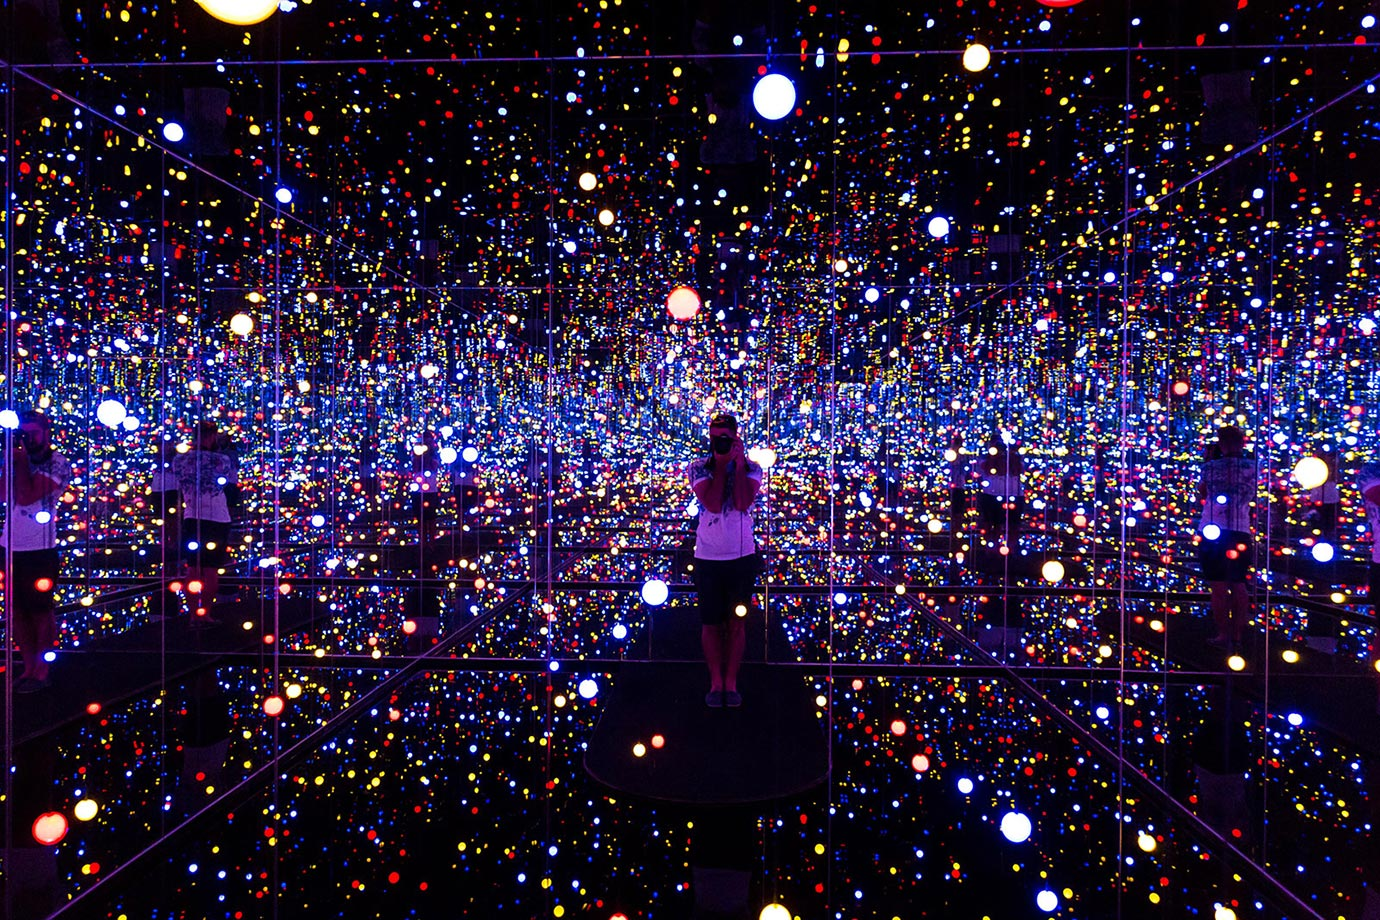 Yayoi Kusama's exhibition, Louisiana, Copenhagen